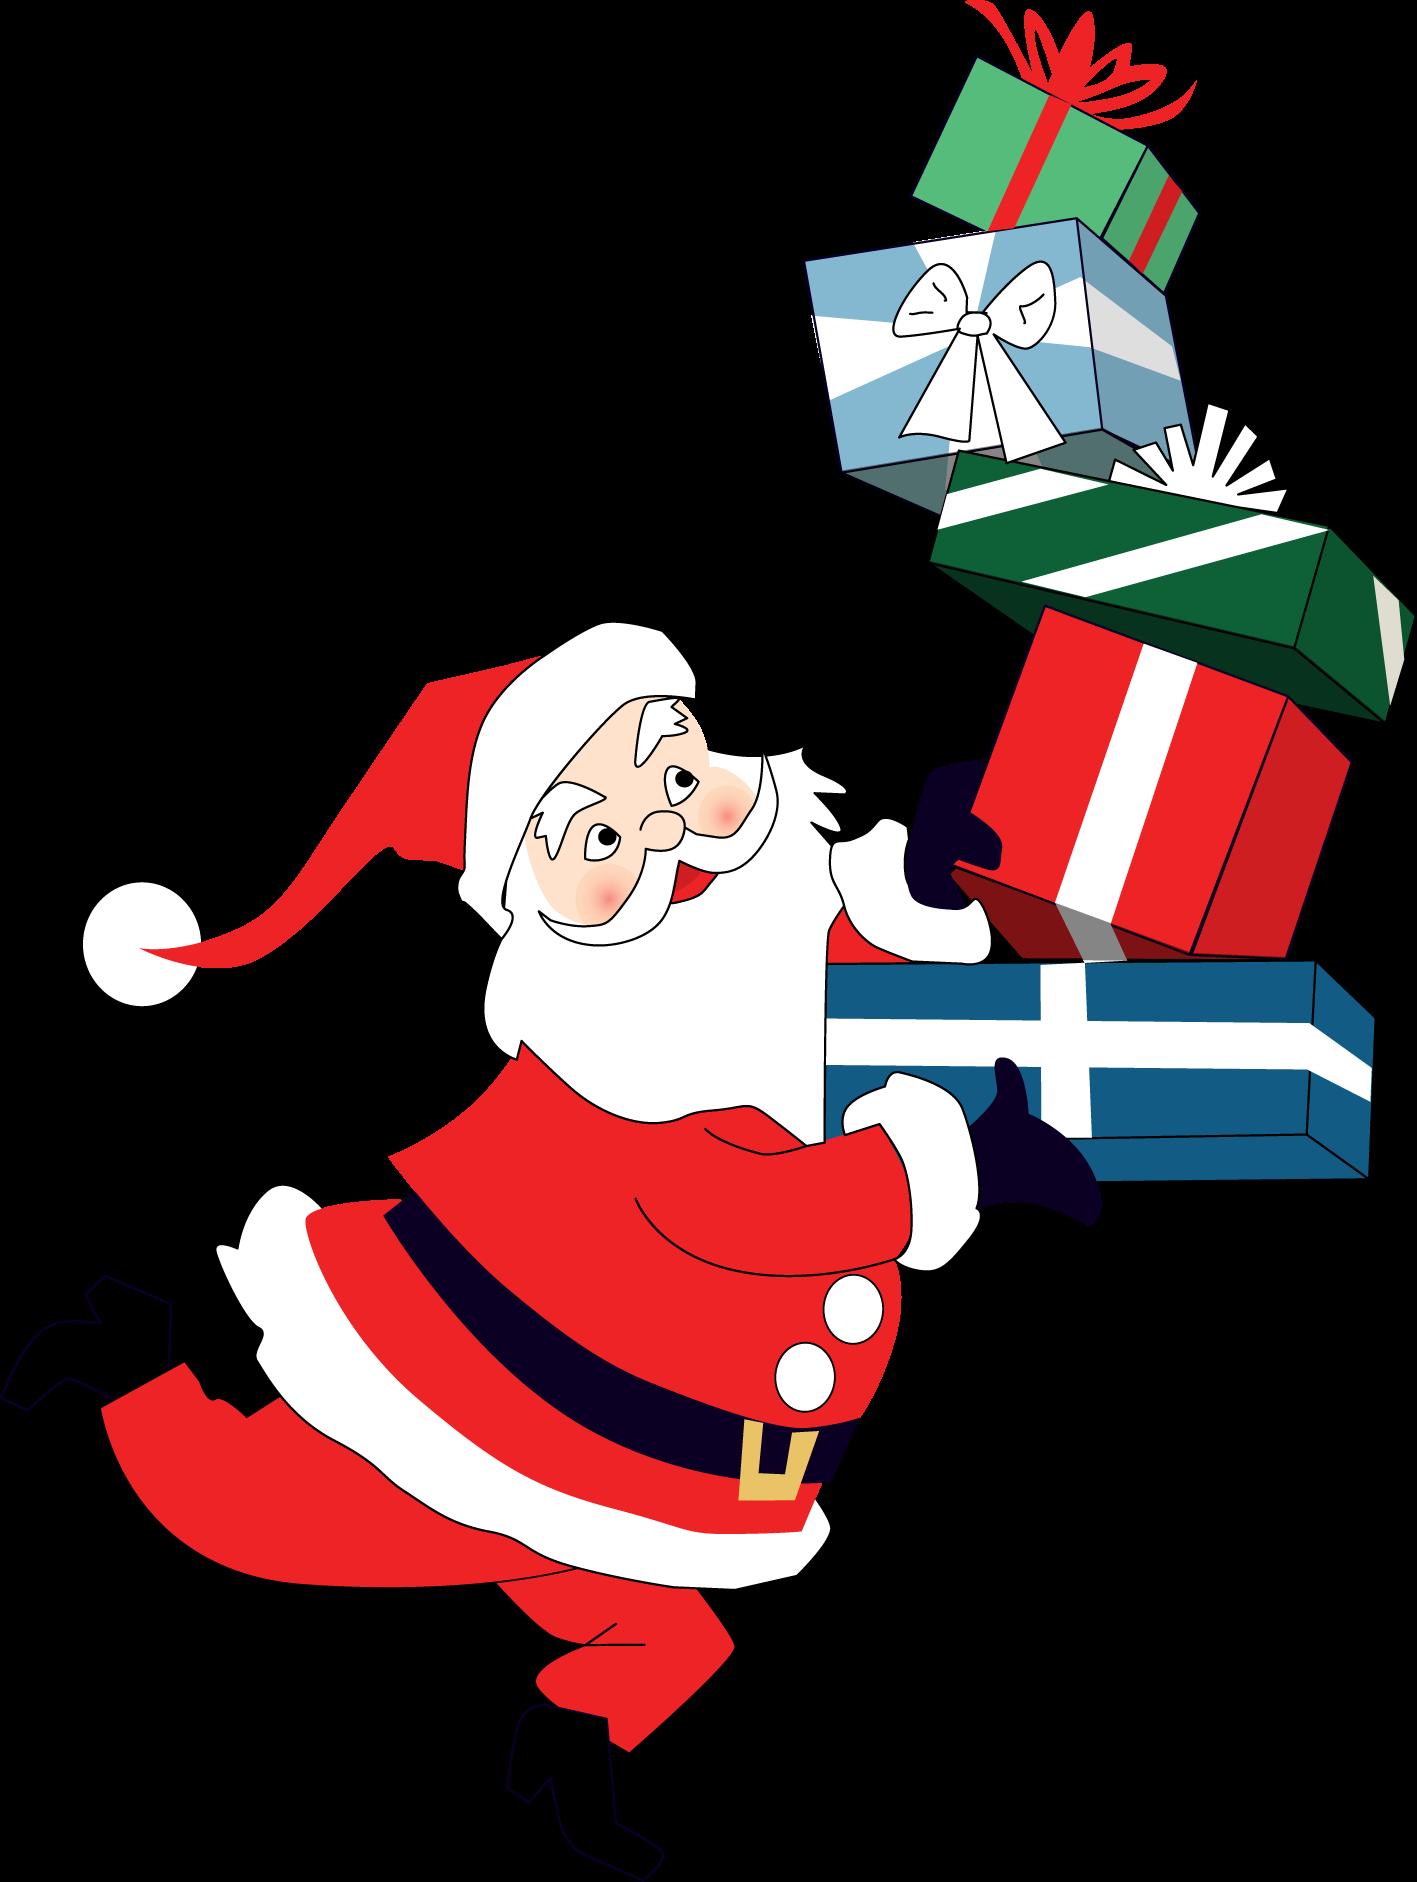 Merry Christmas Santa Print & Cut File